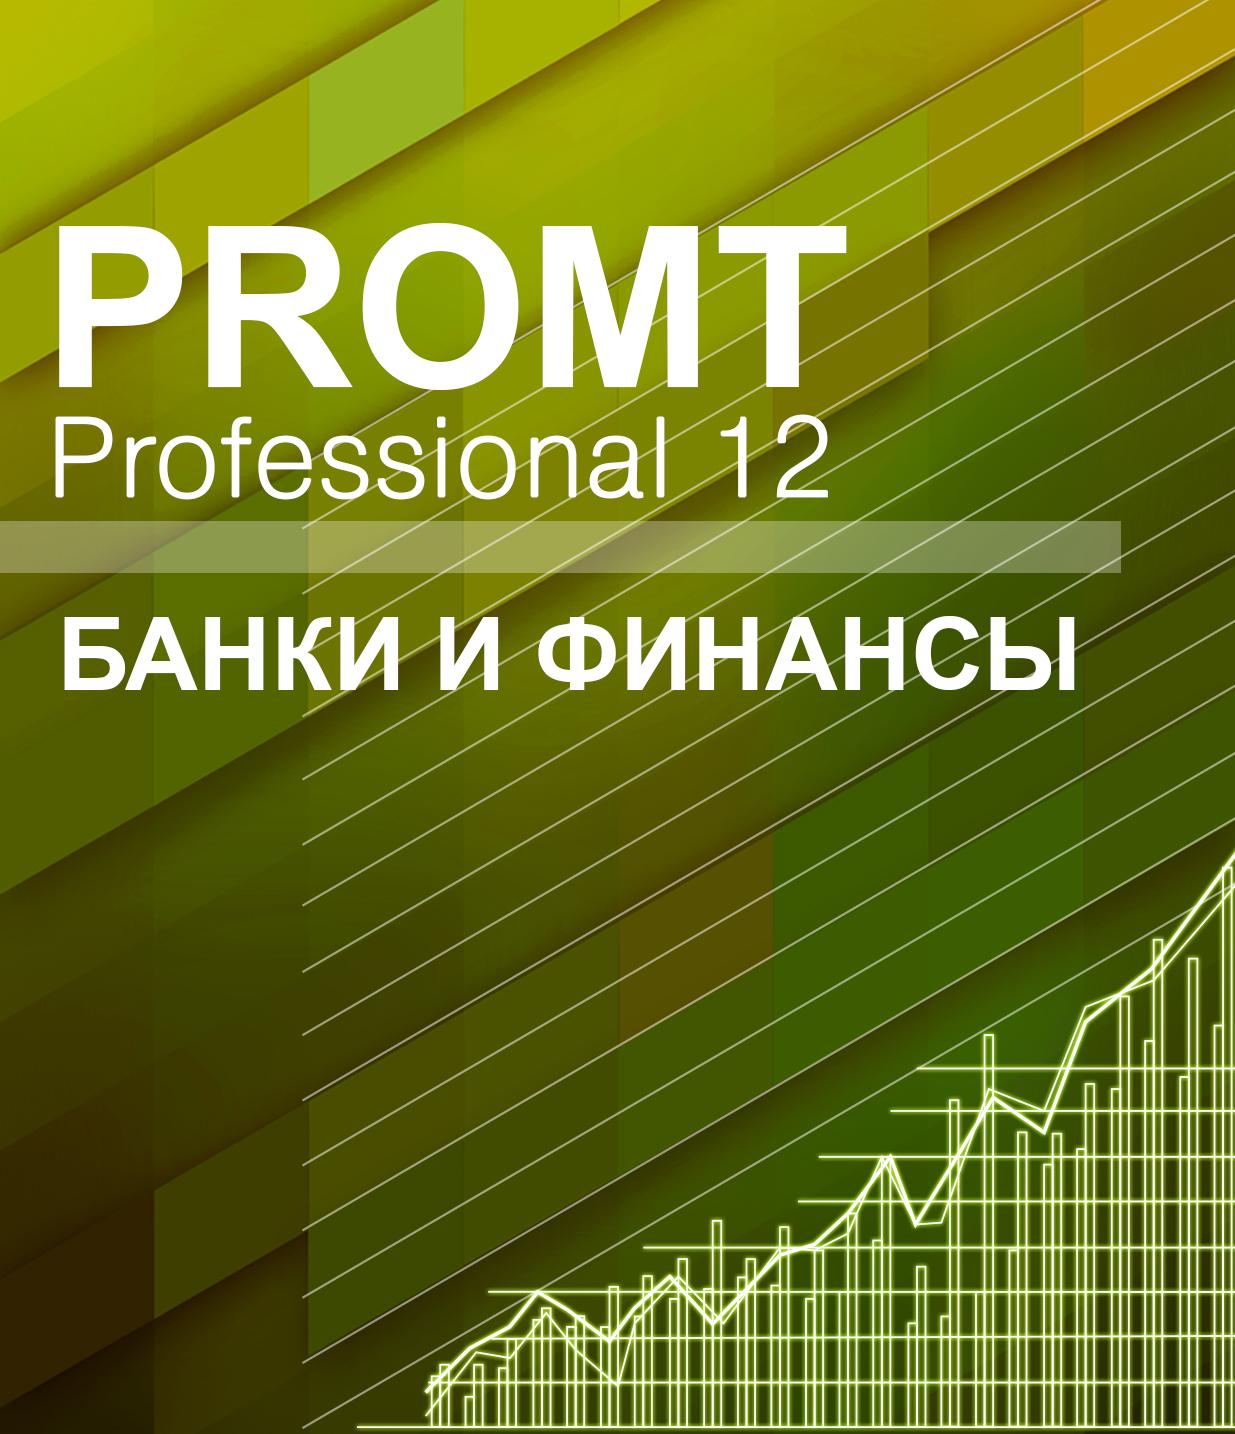 PROMT Professional Банки и финансы